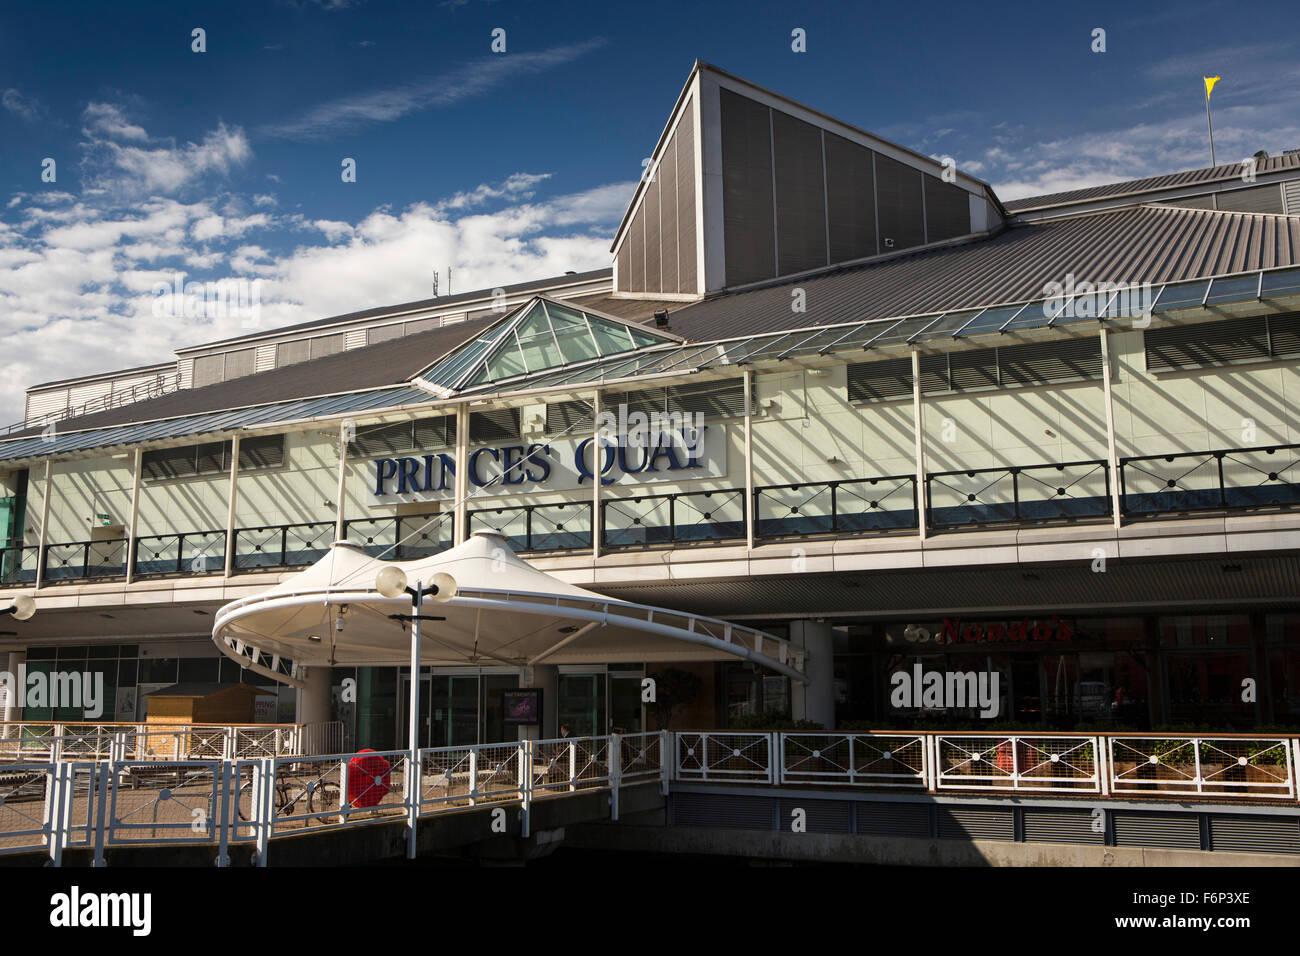 UK, England, Yorkshire, Hull, Princes Dock Shopping Centre, Princes Dock Street entrance - Stock Image